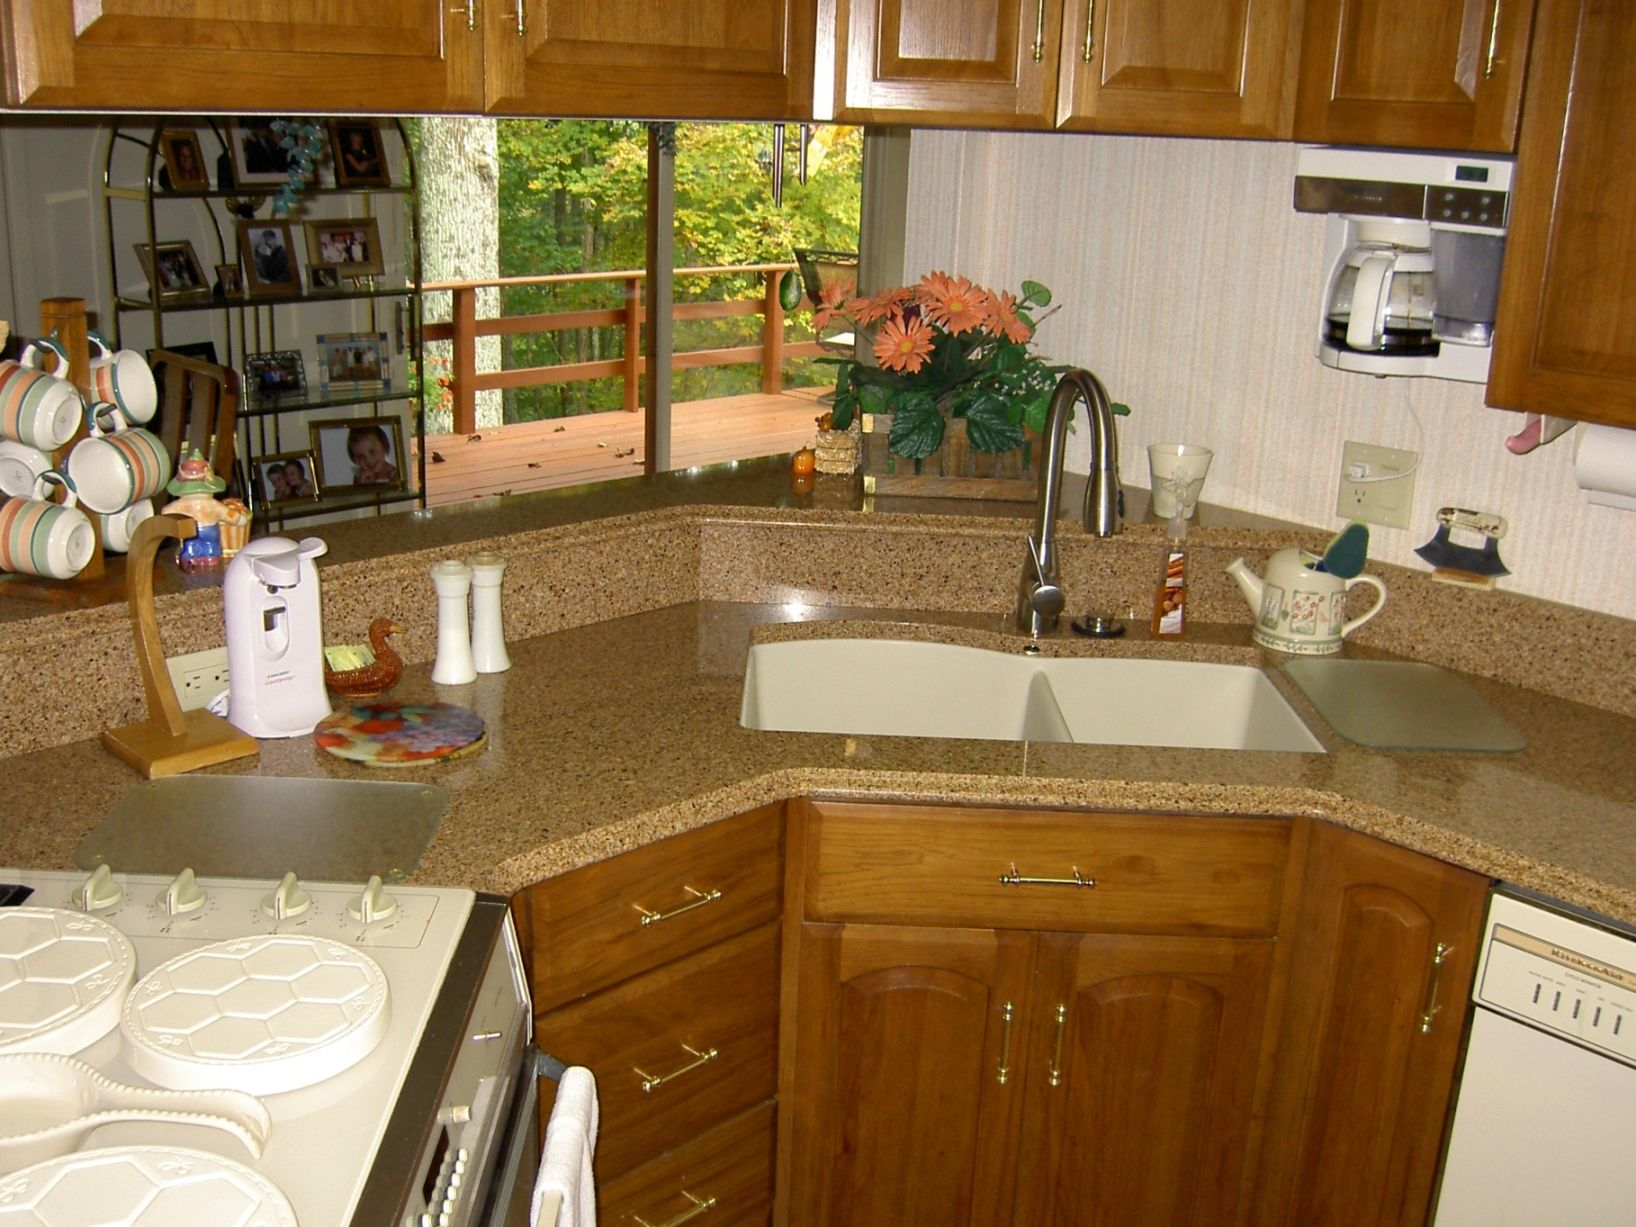 Kitchen Quartz Countertops With Oak Cabinets Quartz Countertops With Honey Oak Cabinets Vanity